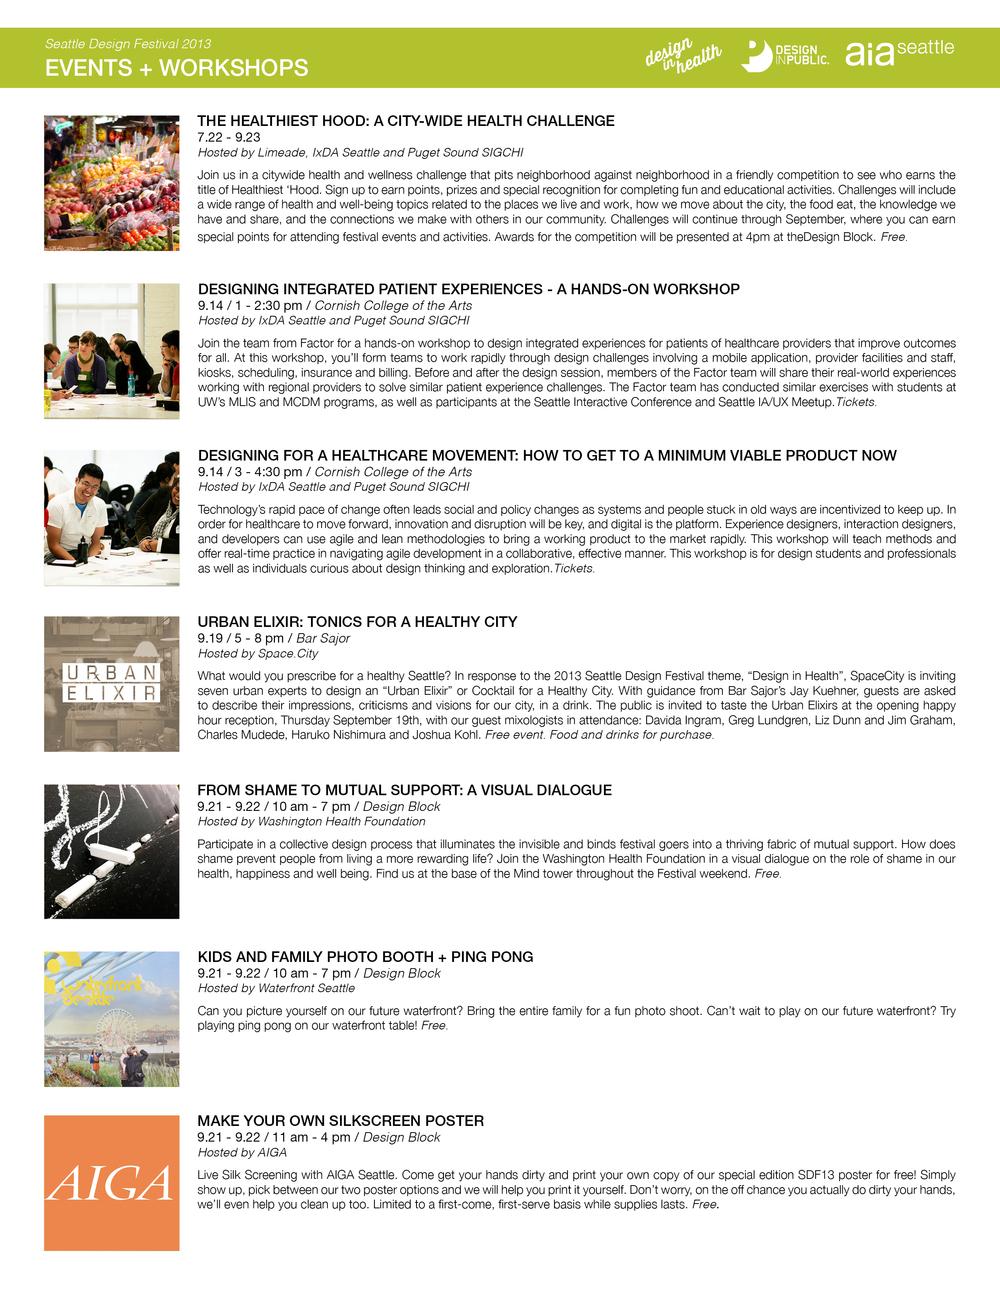 SDF13_festival program_of_events_web28.jpg